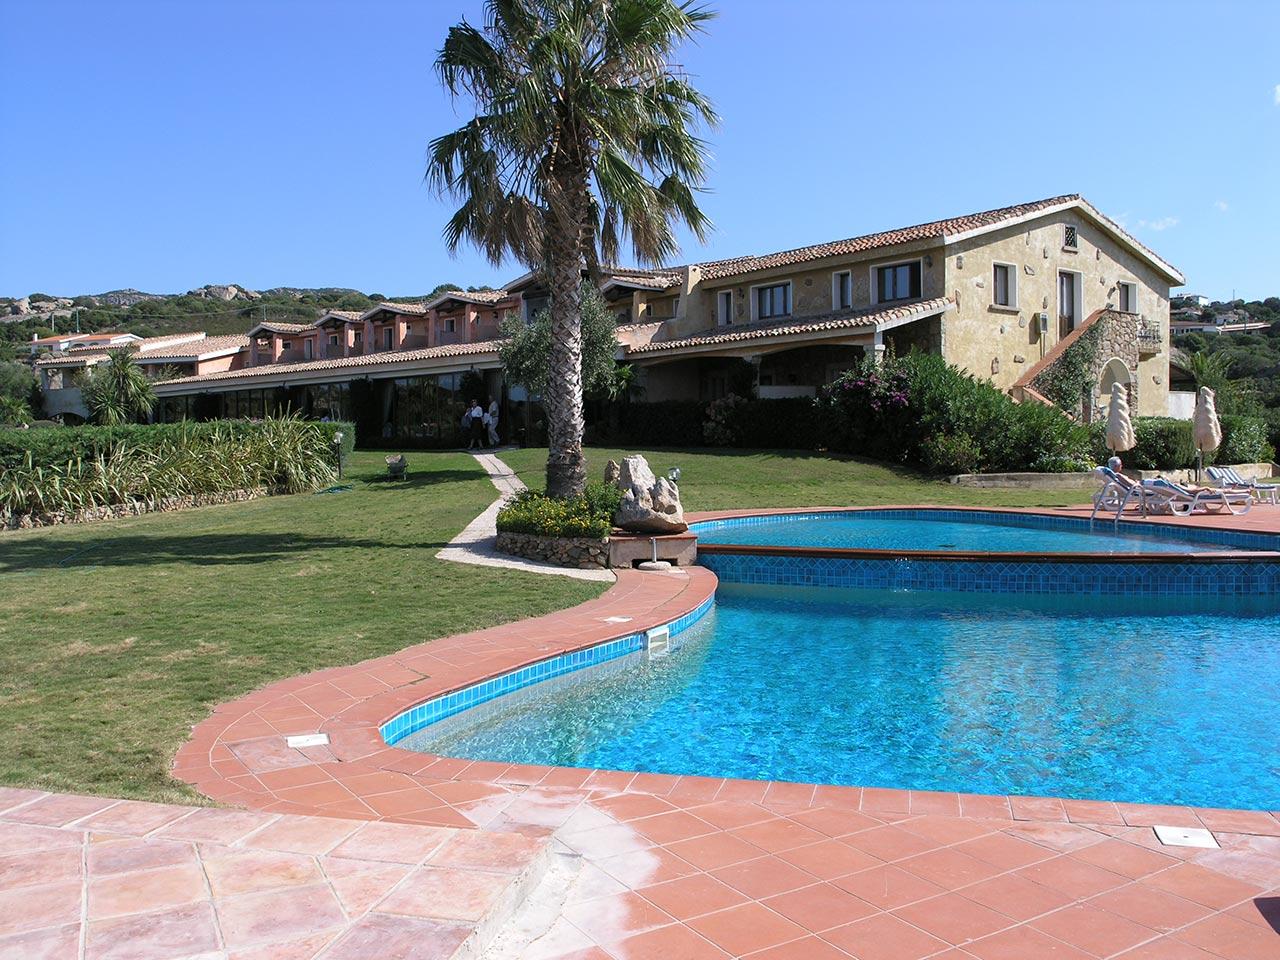 Turismo na Sardenha